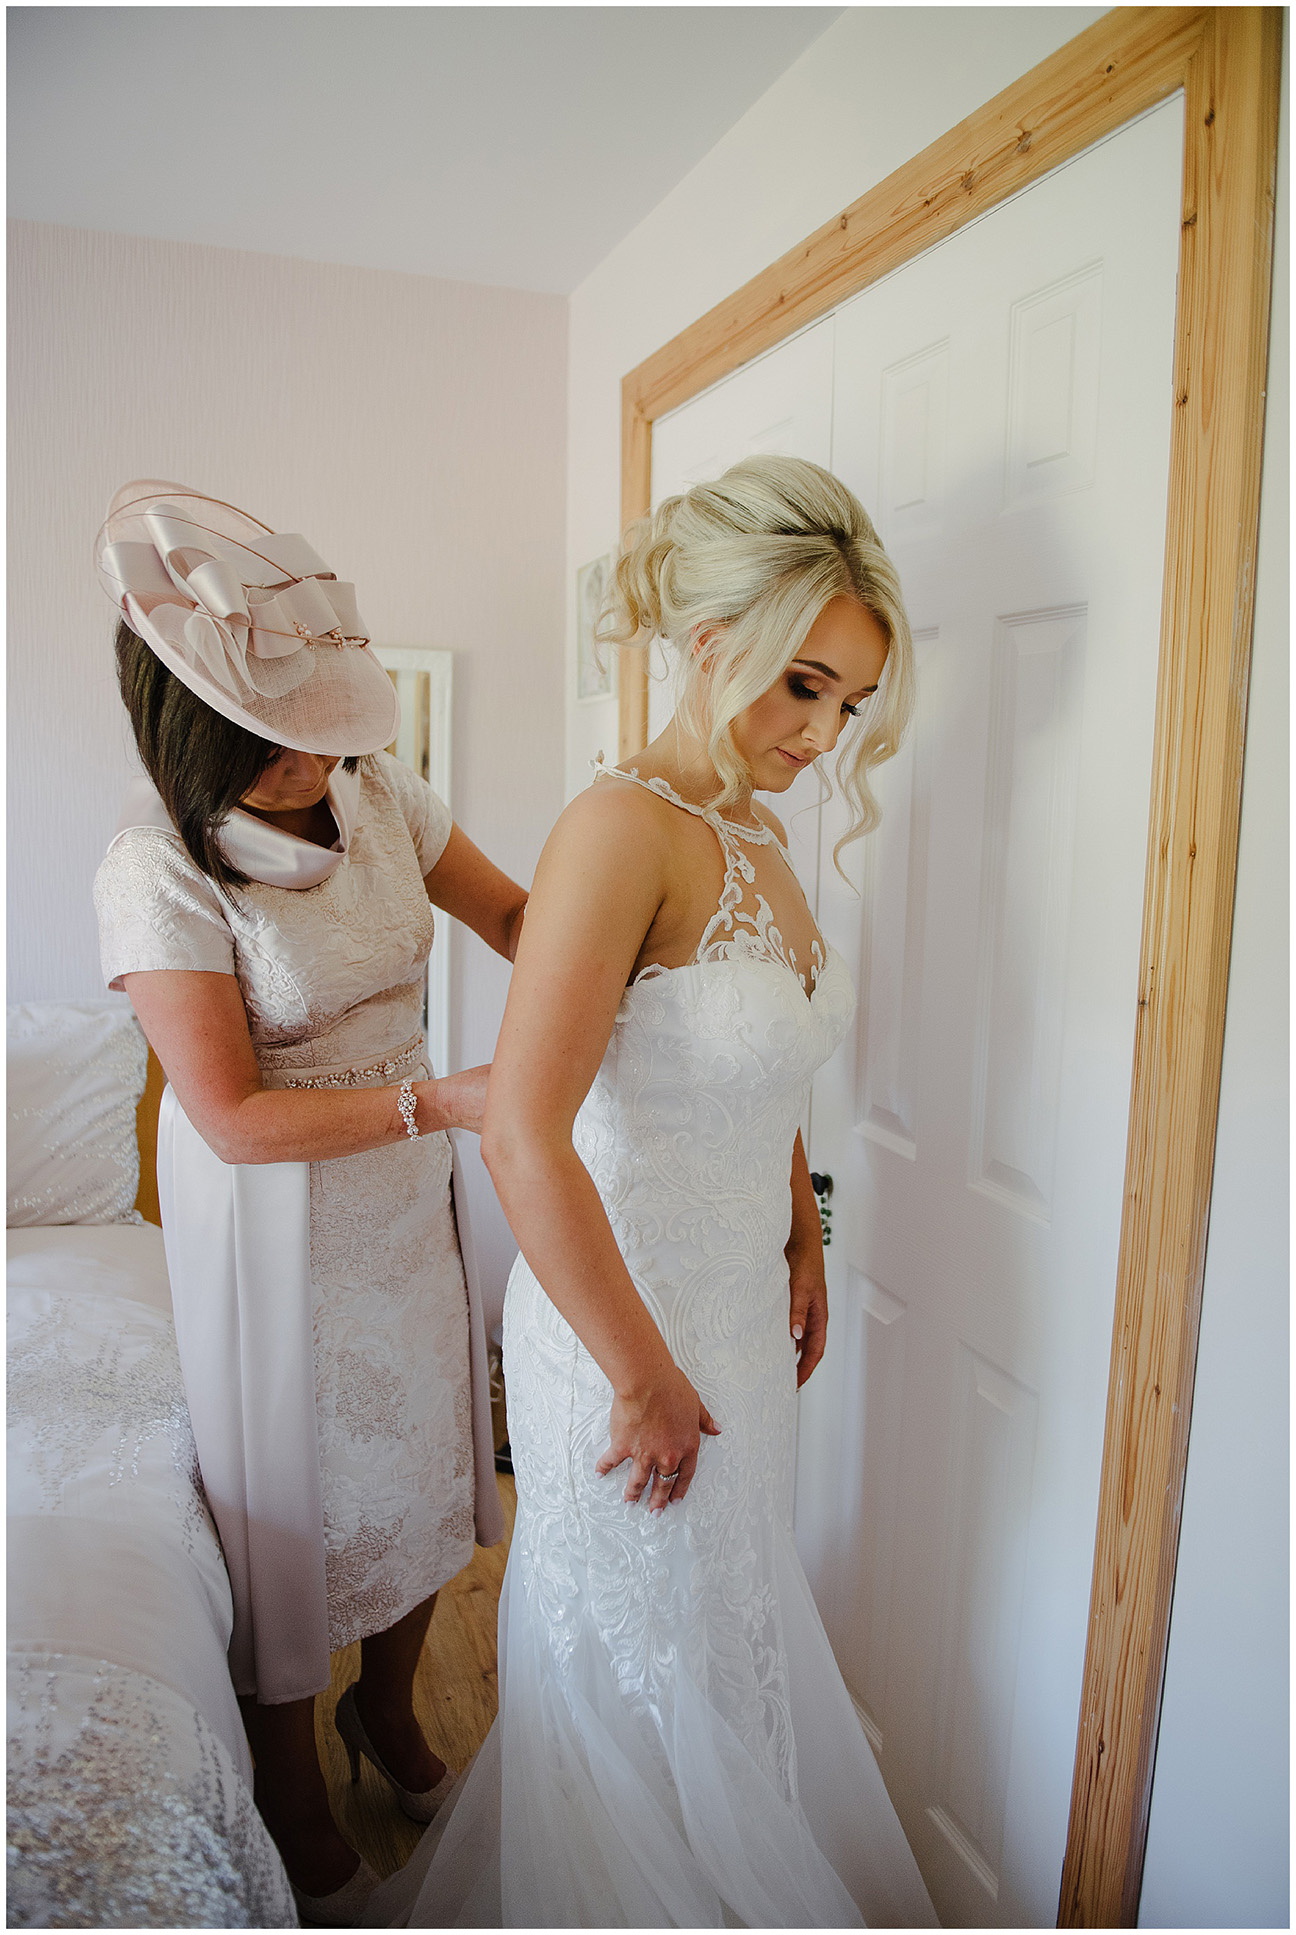 villa-rose-hotel-wedding-jude-browne-photography_0025.jpg